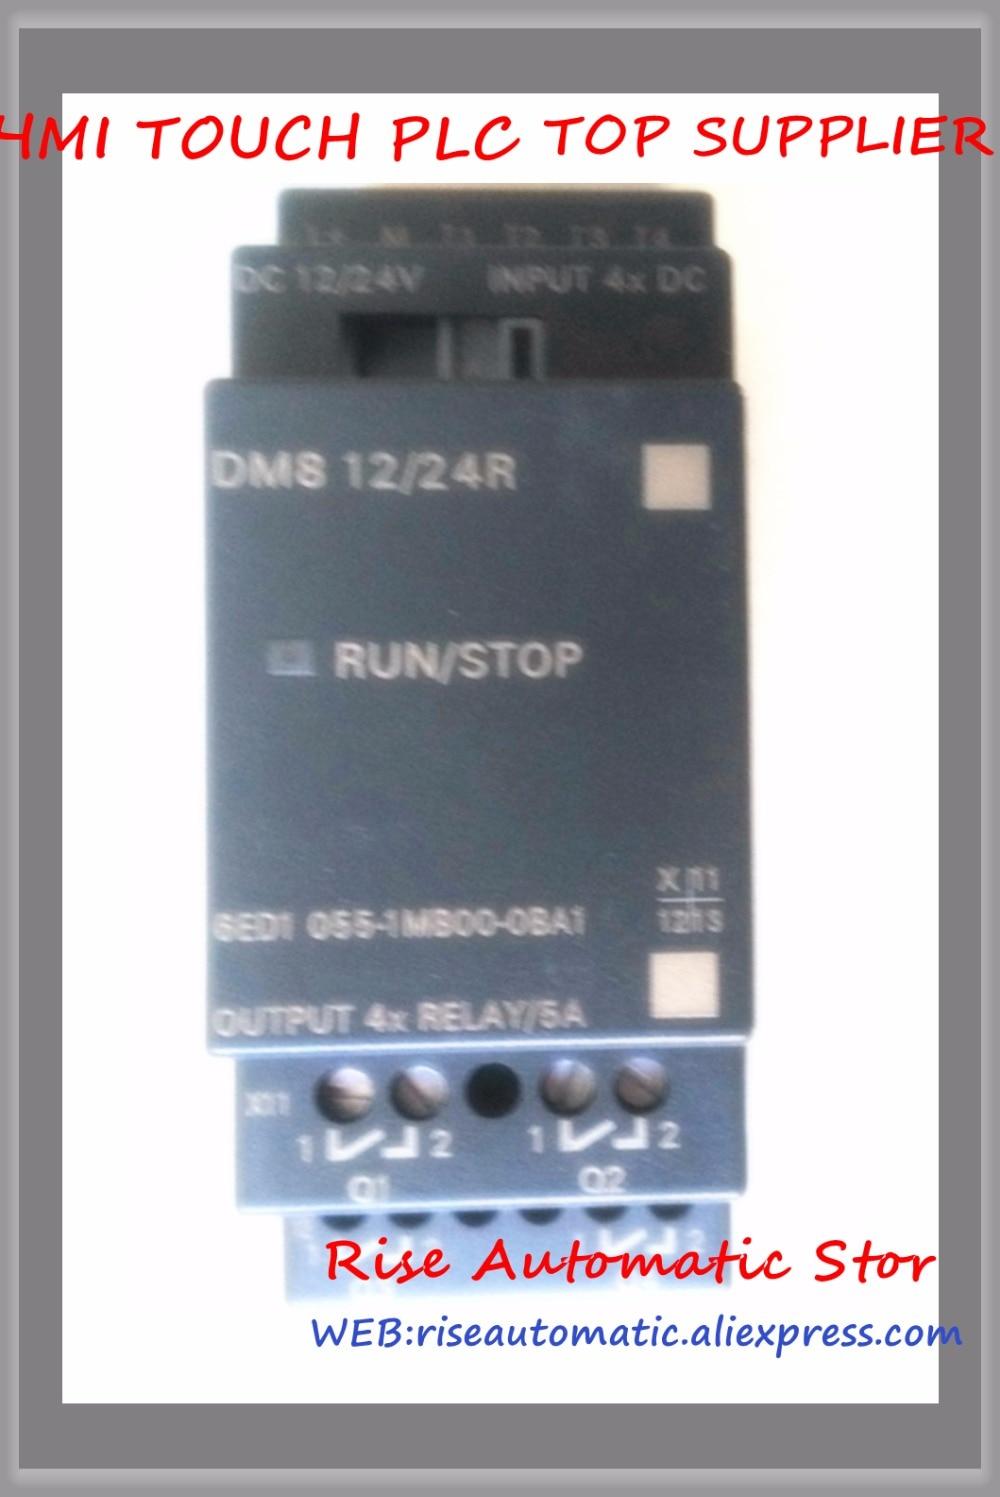 Original 6ED1055-1MB00-0BA1 LOGO! DM8 12/24R Expansion Module 4 DI/4 DO 6ED1 055-1MB00-0BA1 6ED10551MB000BA1